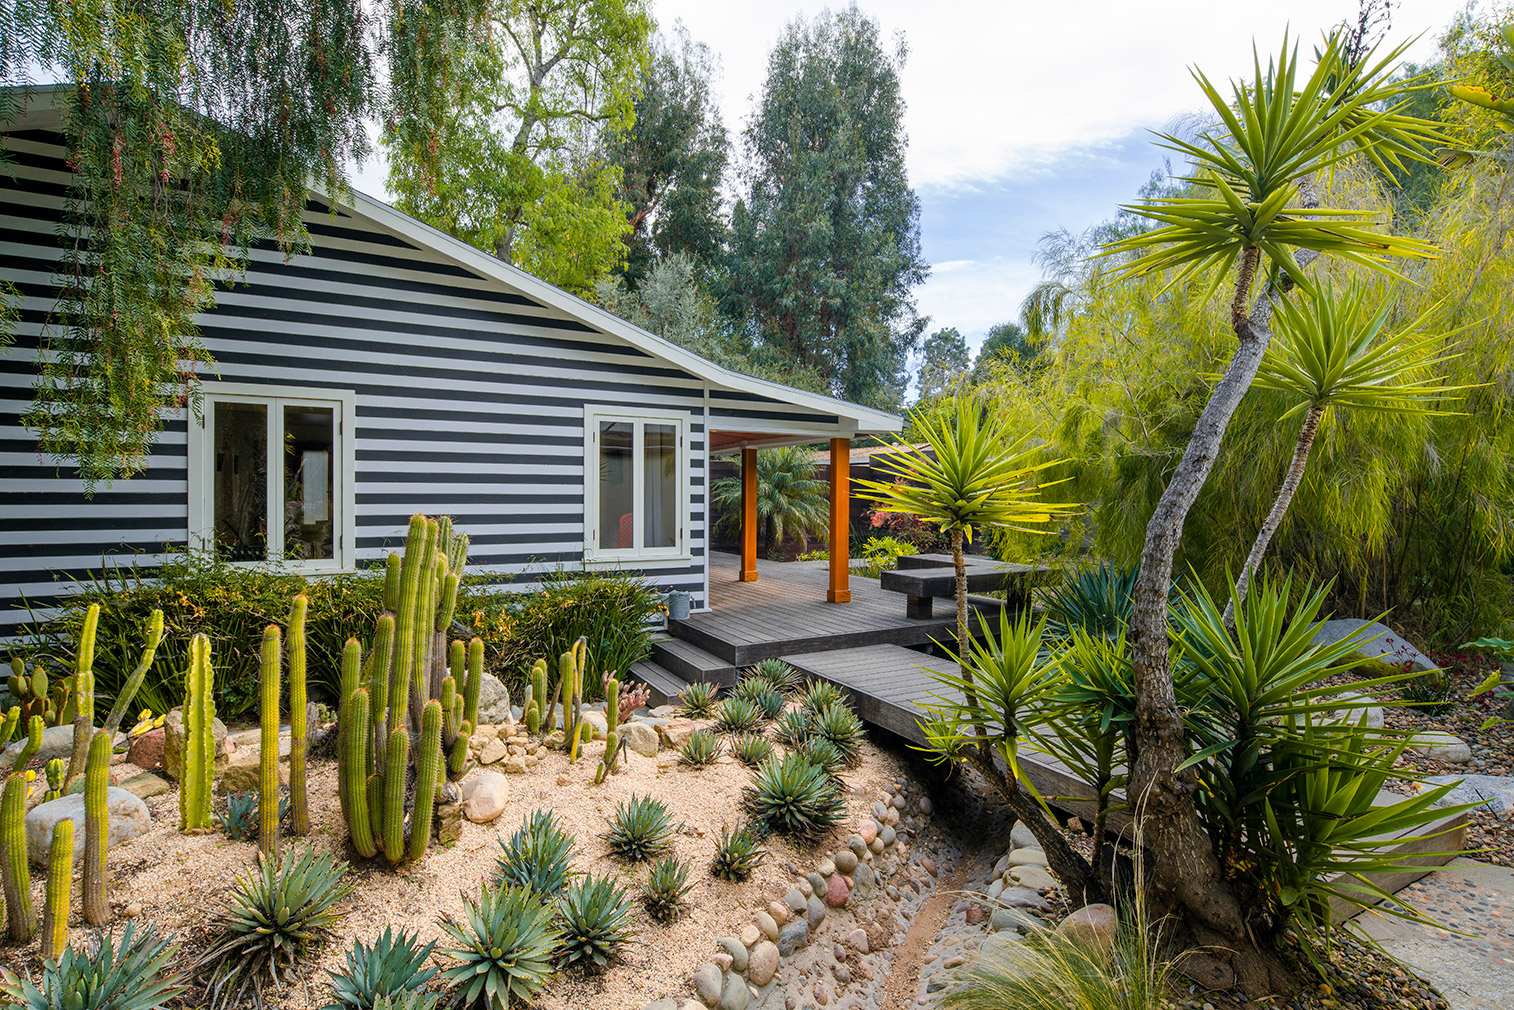 Artist Liza Lou's 1930s home and studio is for sale in LA County